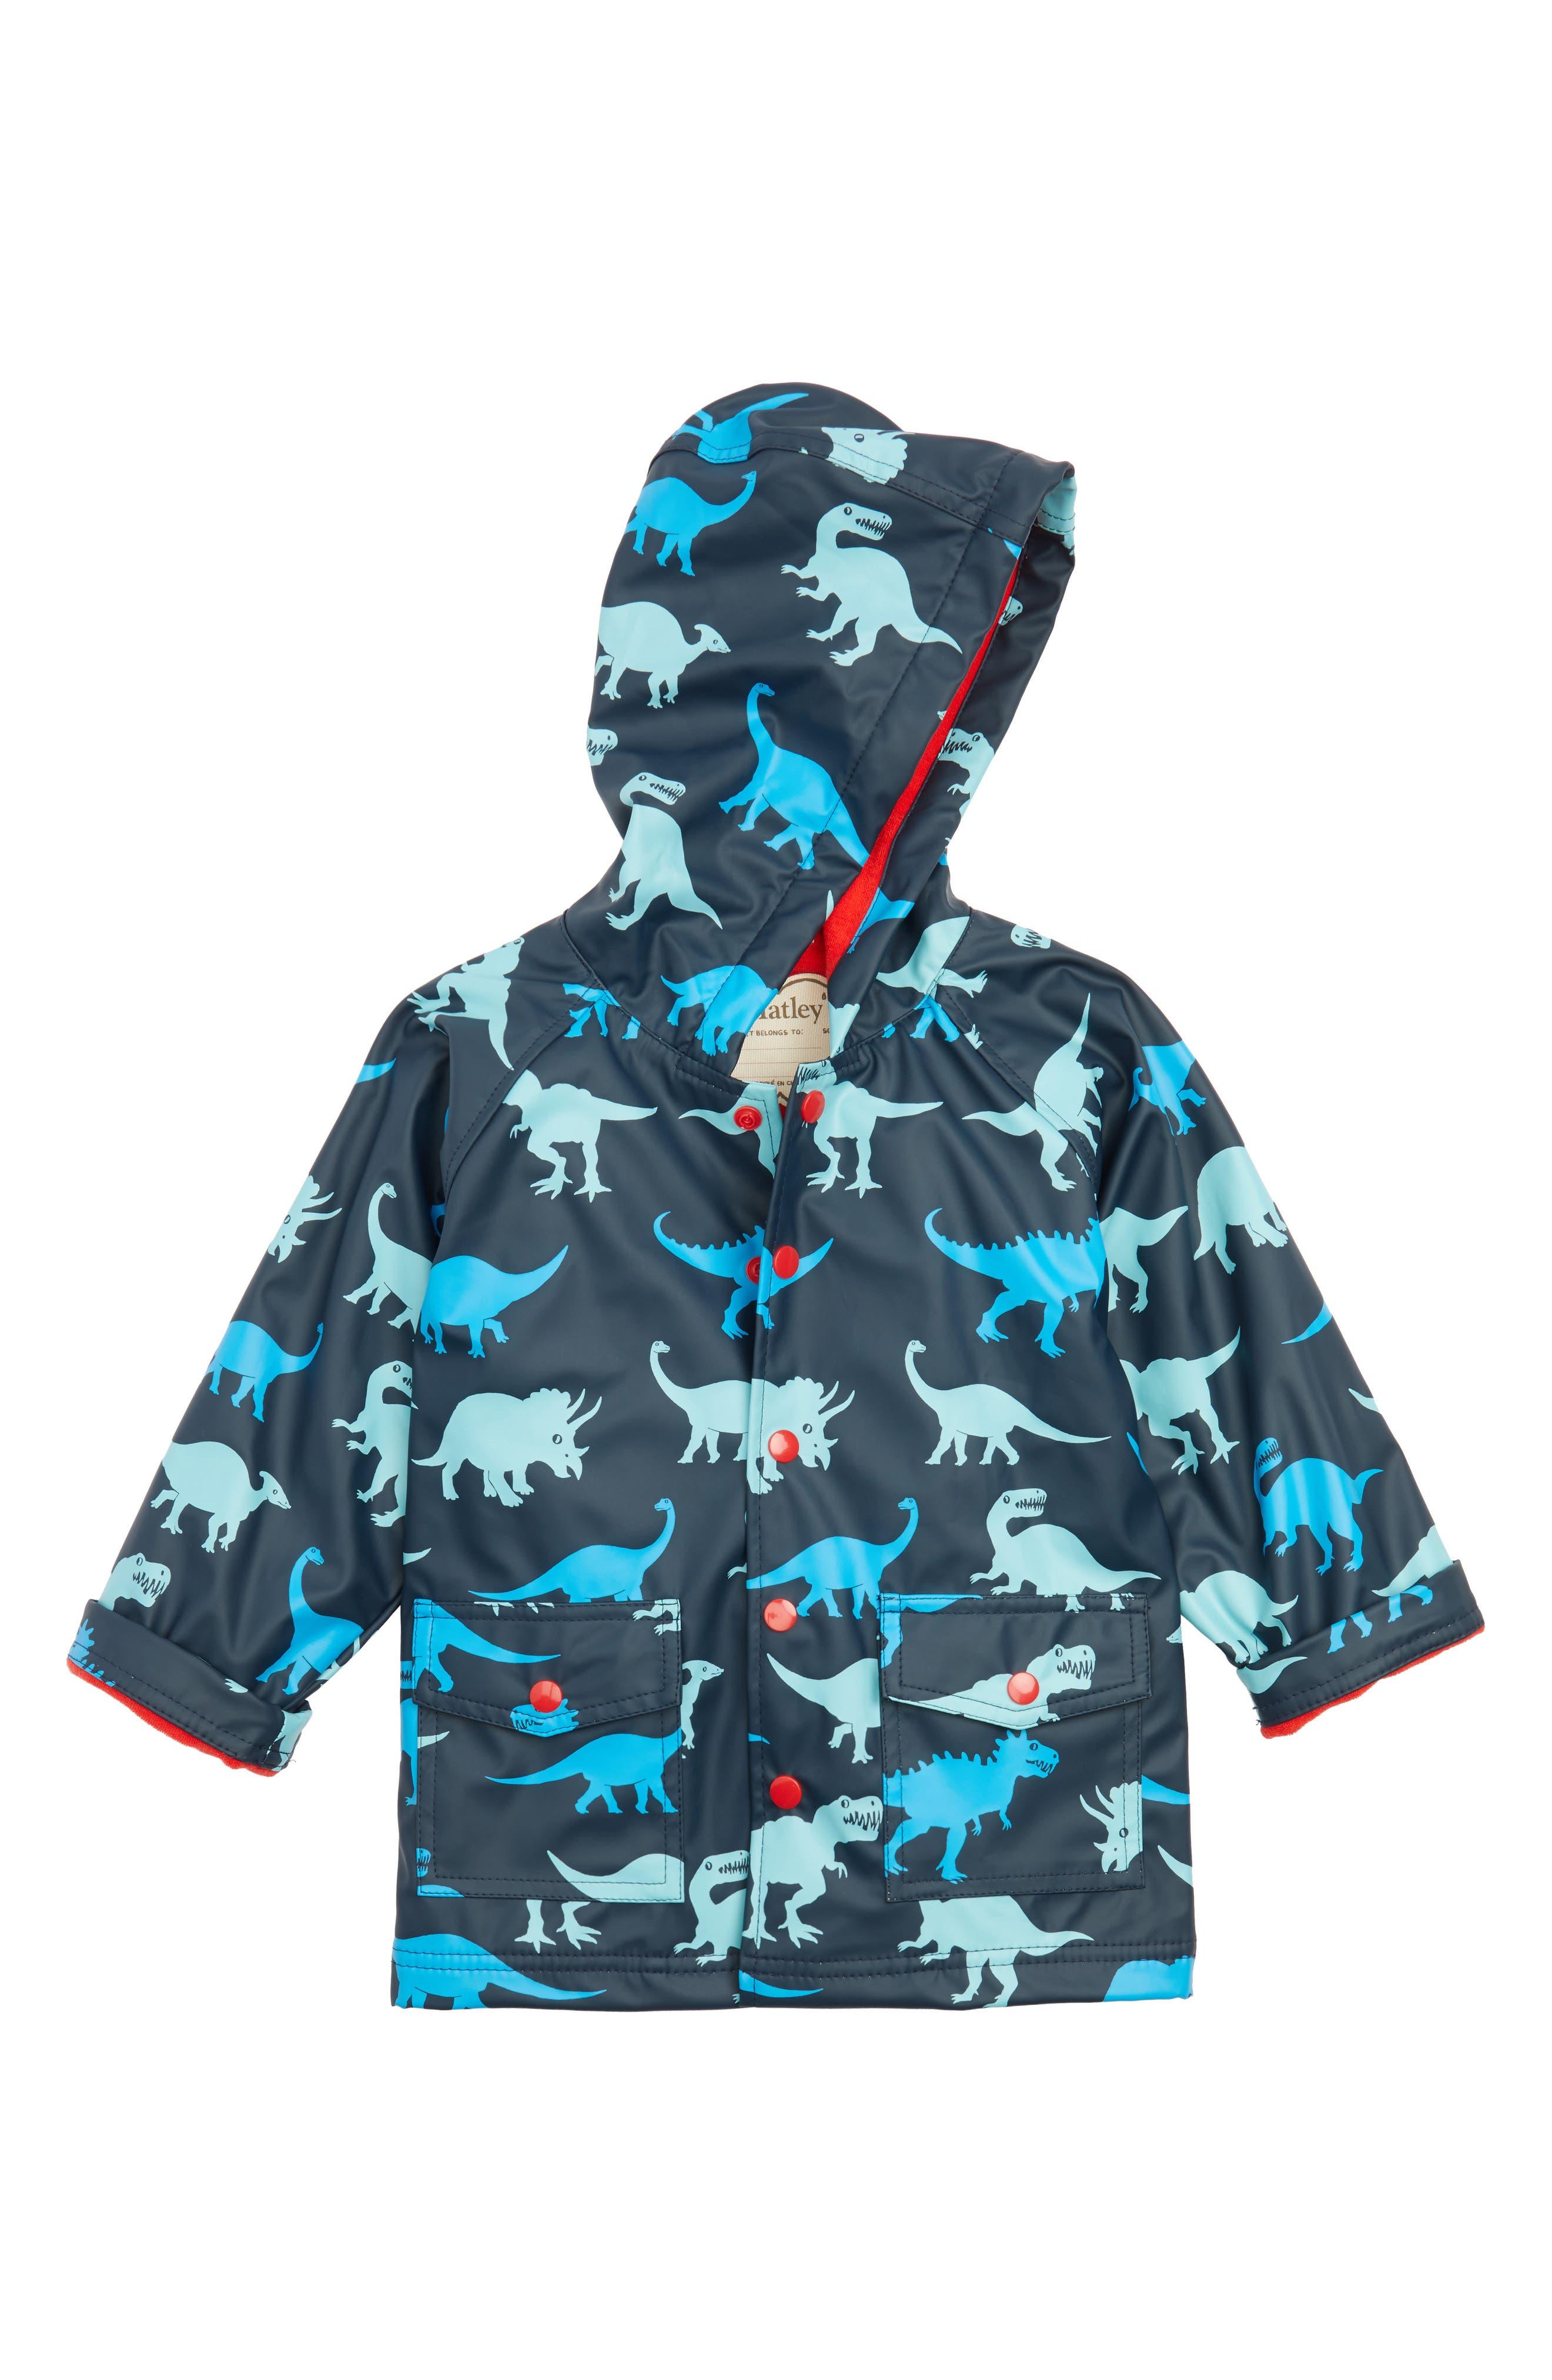 Main Image - Hatley Dino Shadows Print Raincoat (Toddler Boys, Little Boys and Big Boys)